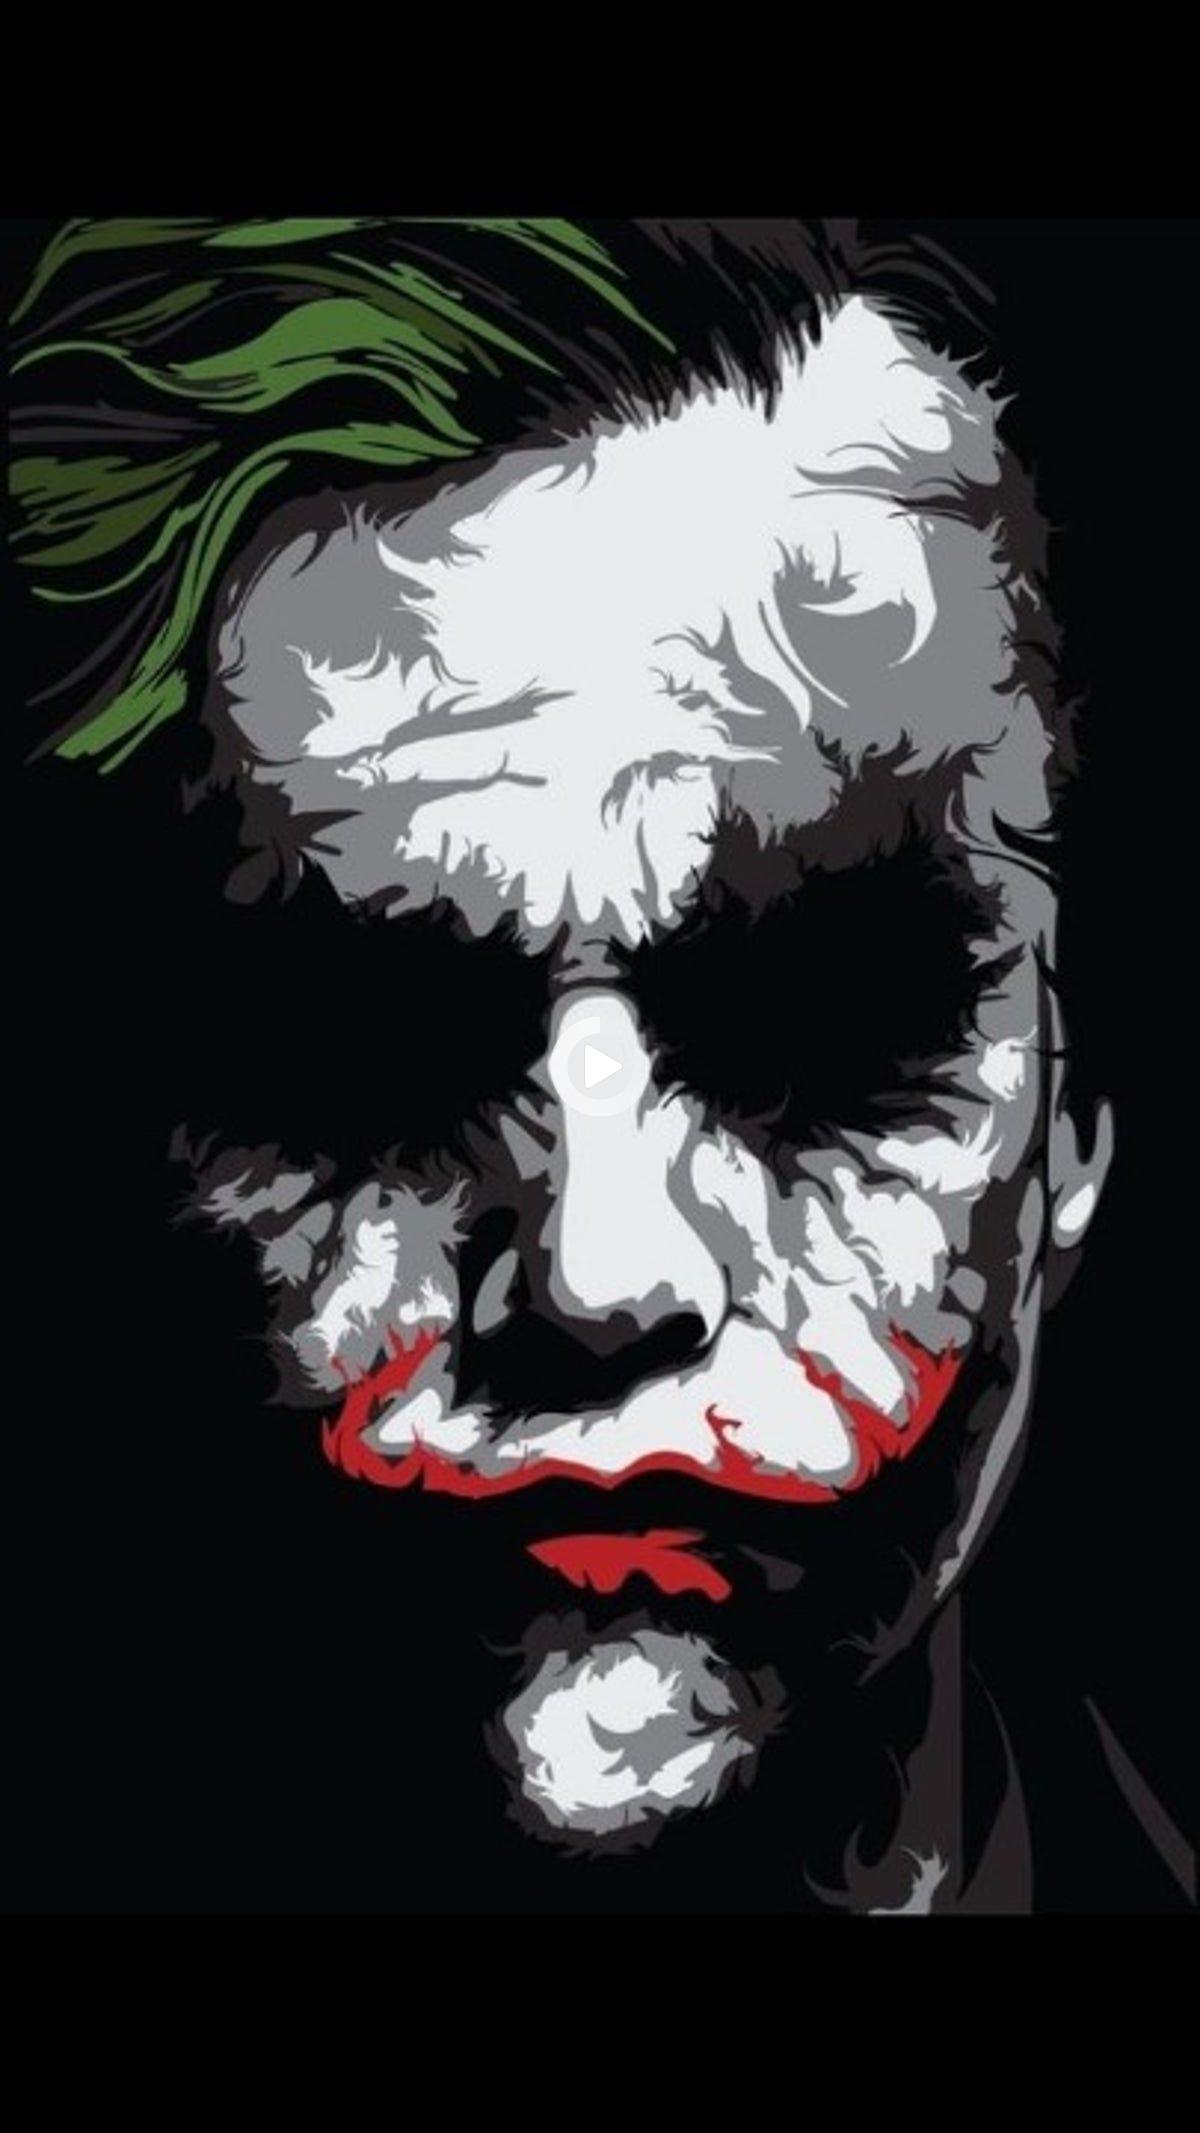 Redirecting In 2021 Joker Hd Wallpaper Joker Wallpapers Joker Iphone Wallpaper 4k ultra hd joker wallpaper 2021